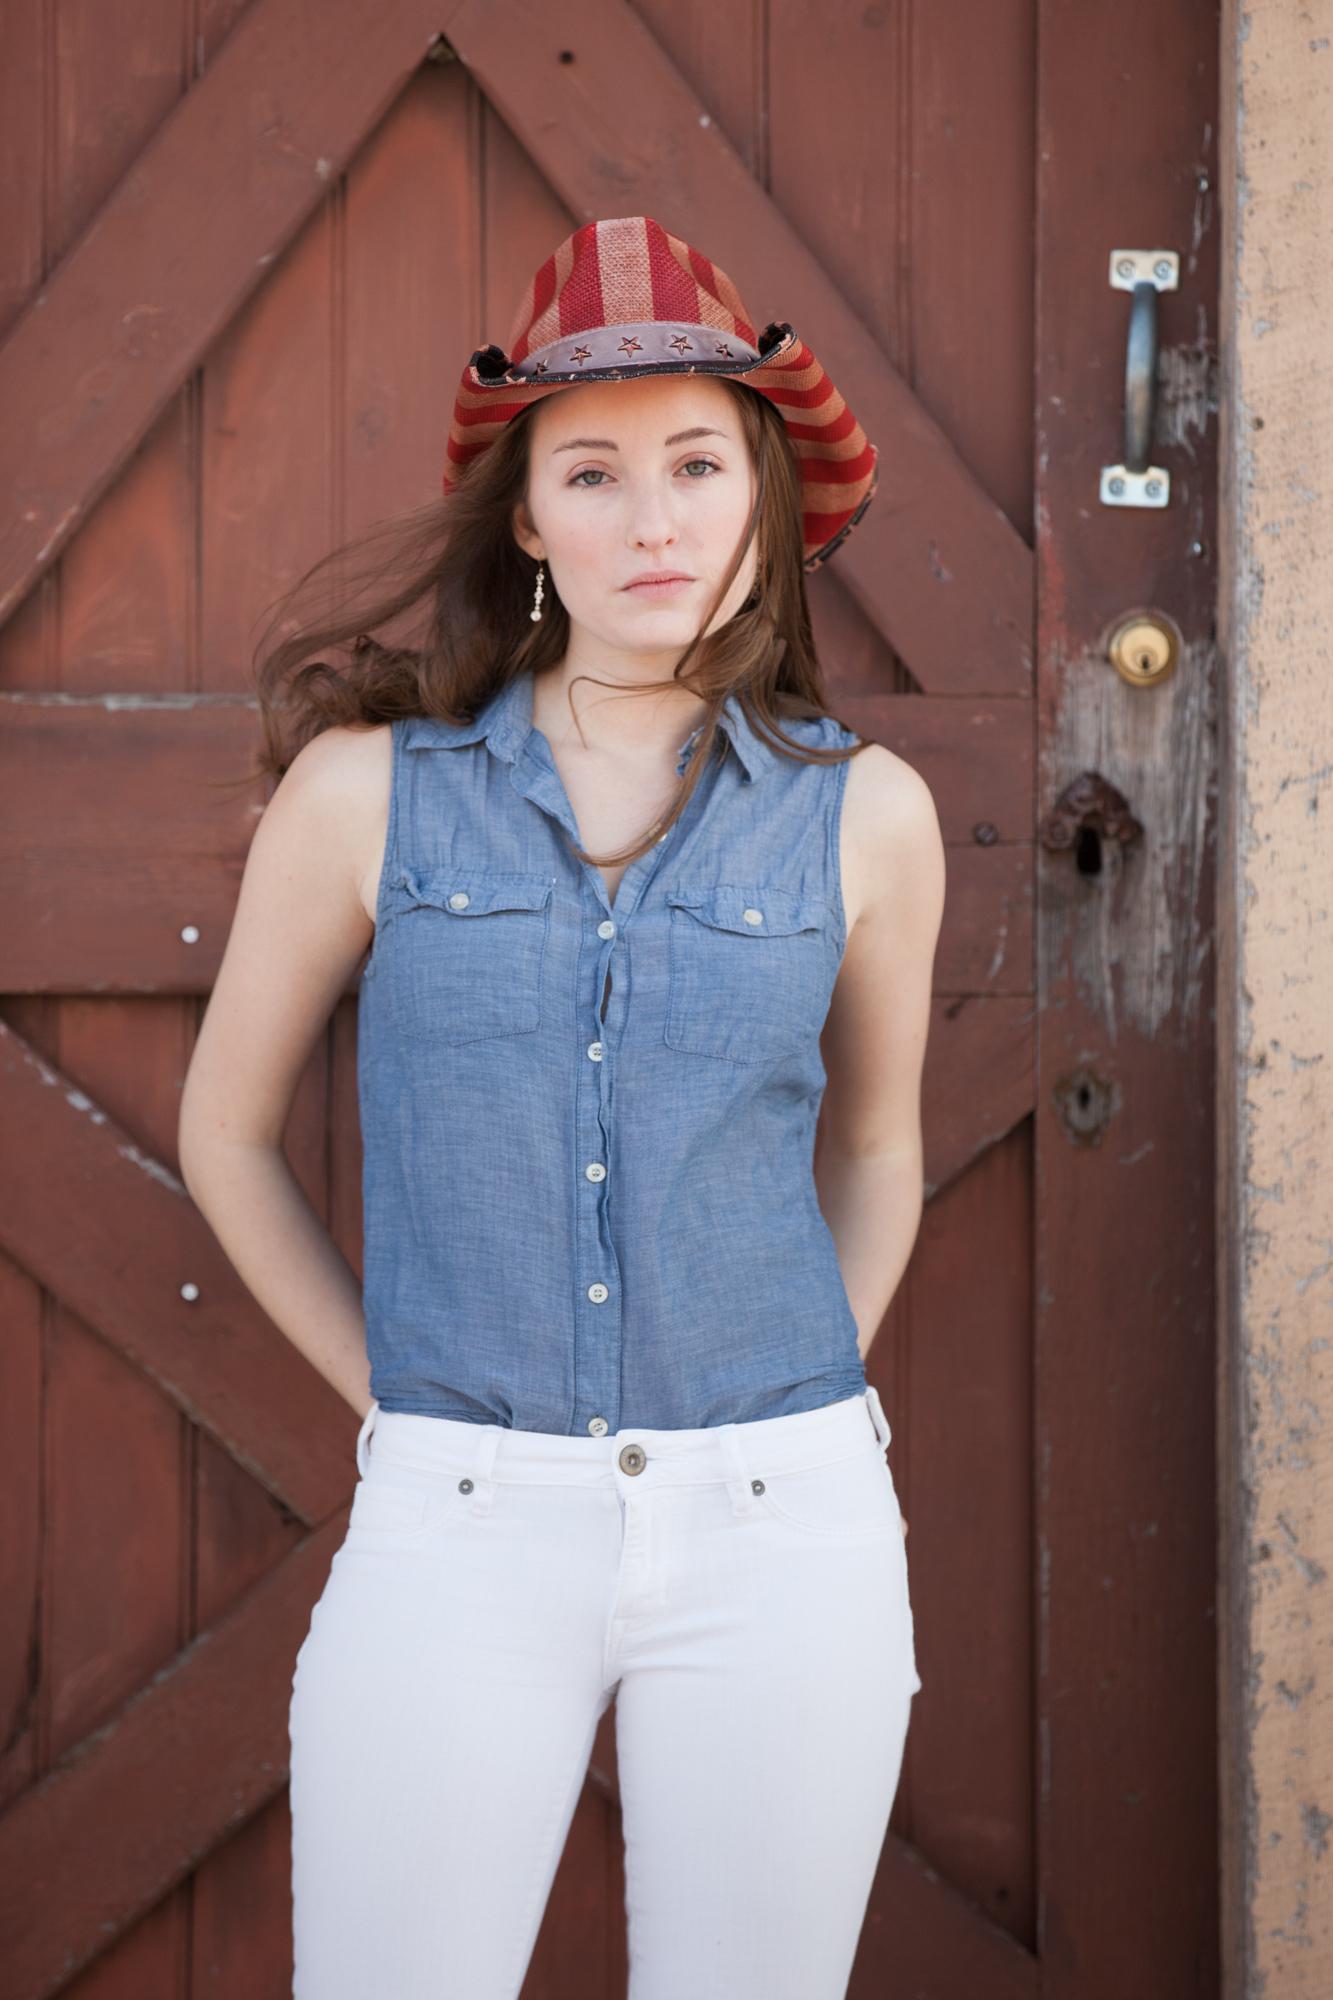 american-girl-denim-shirt-white-jeans-cowboy-hat.jpg